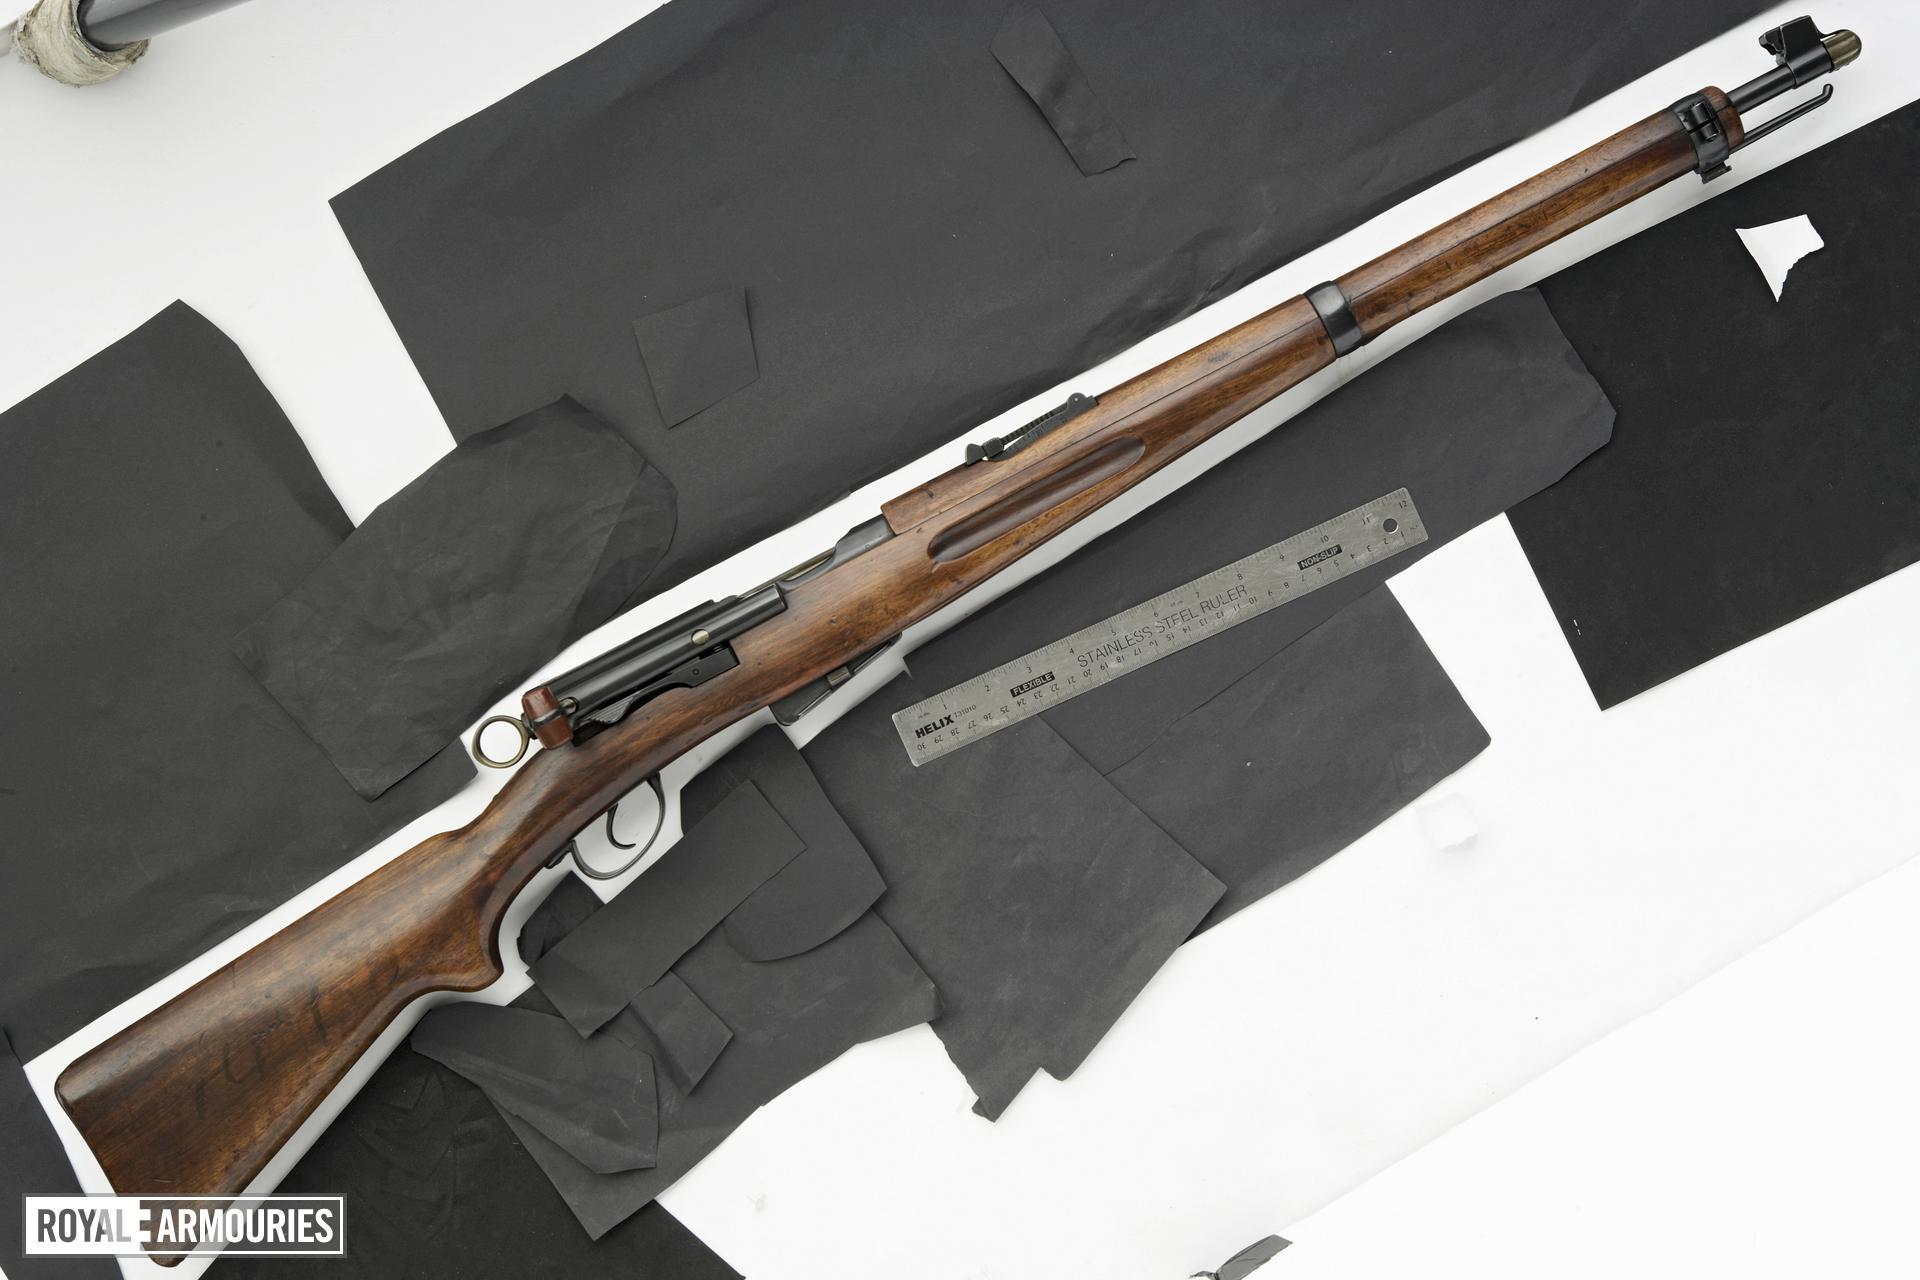 Centrefire bolt-action carbine - Schmidt-Rubin Model 1911